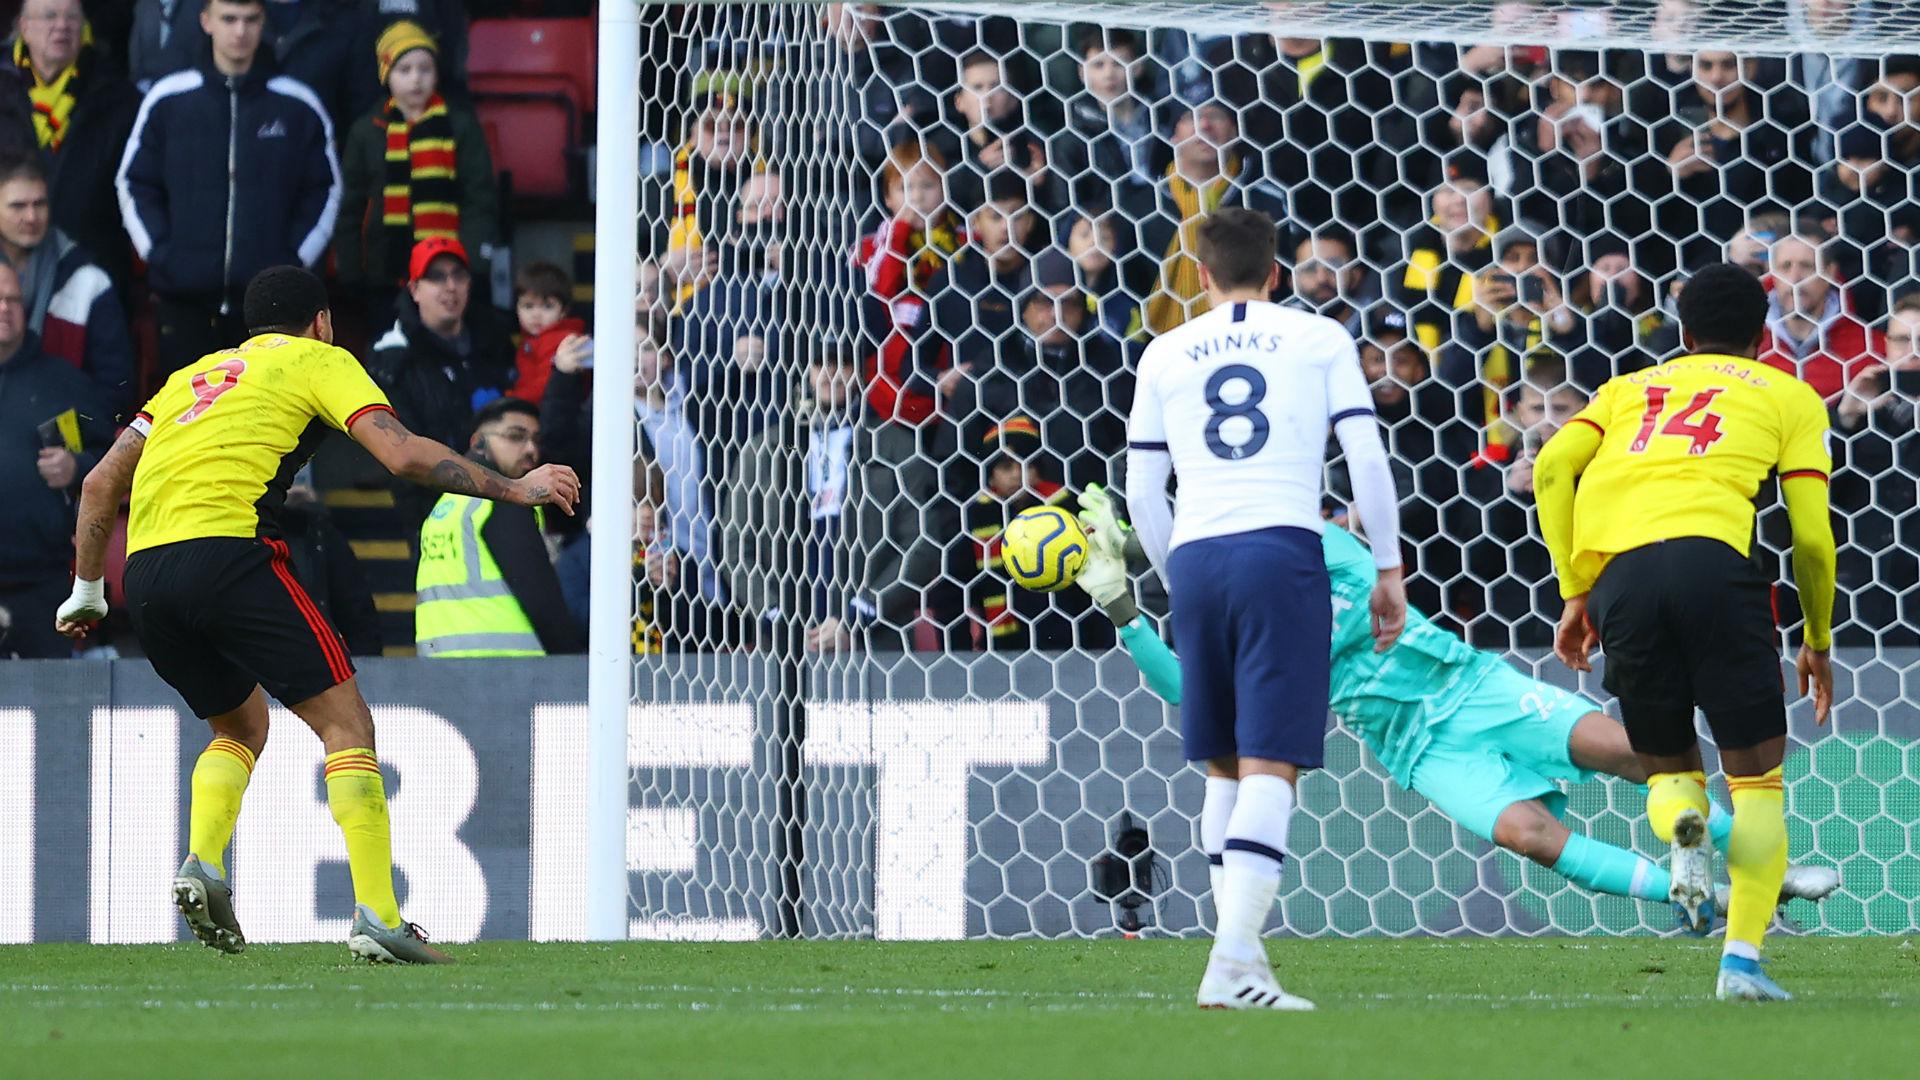 Watford 0-0 Tottenham: Gazzaniga rescues Spurs in drab draw